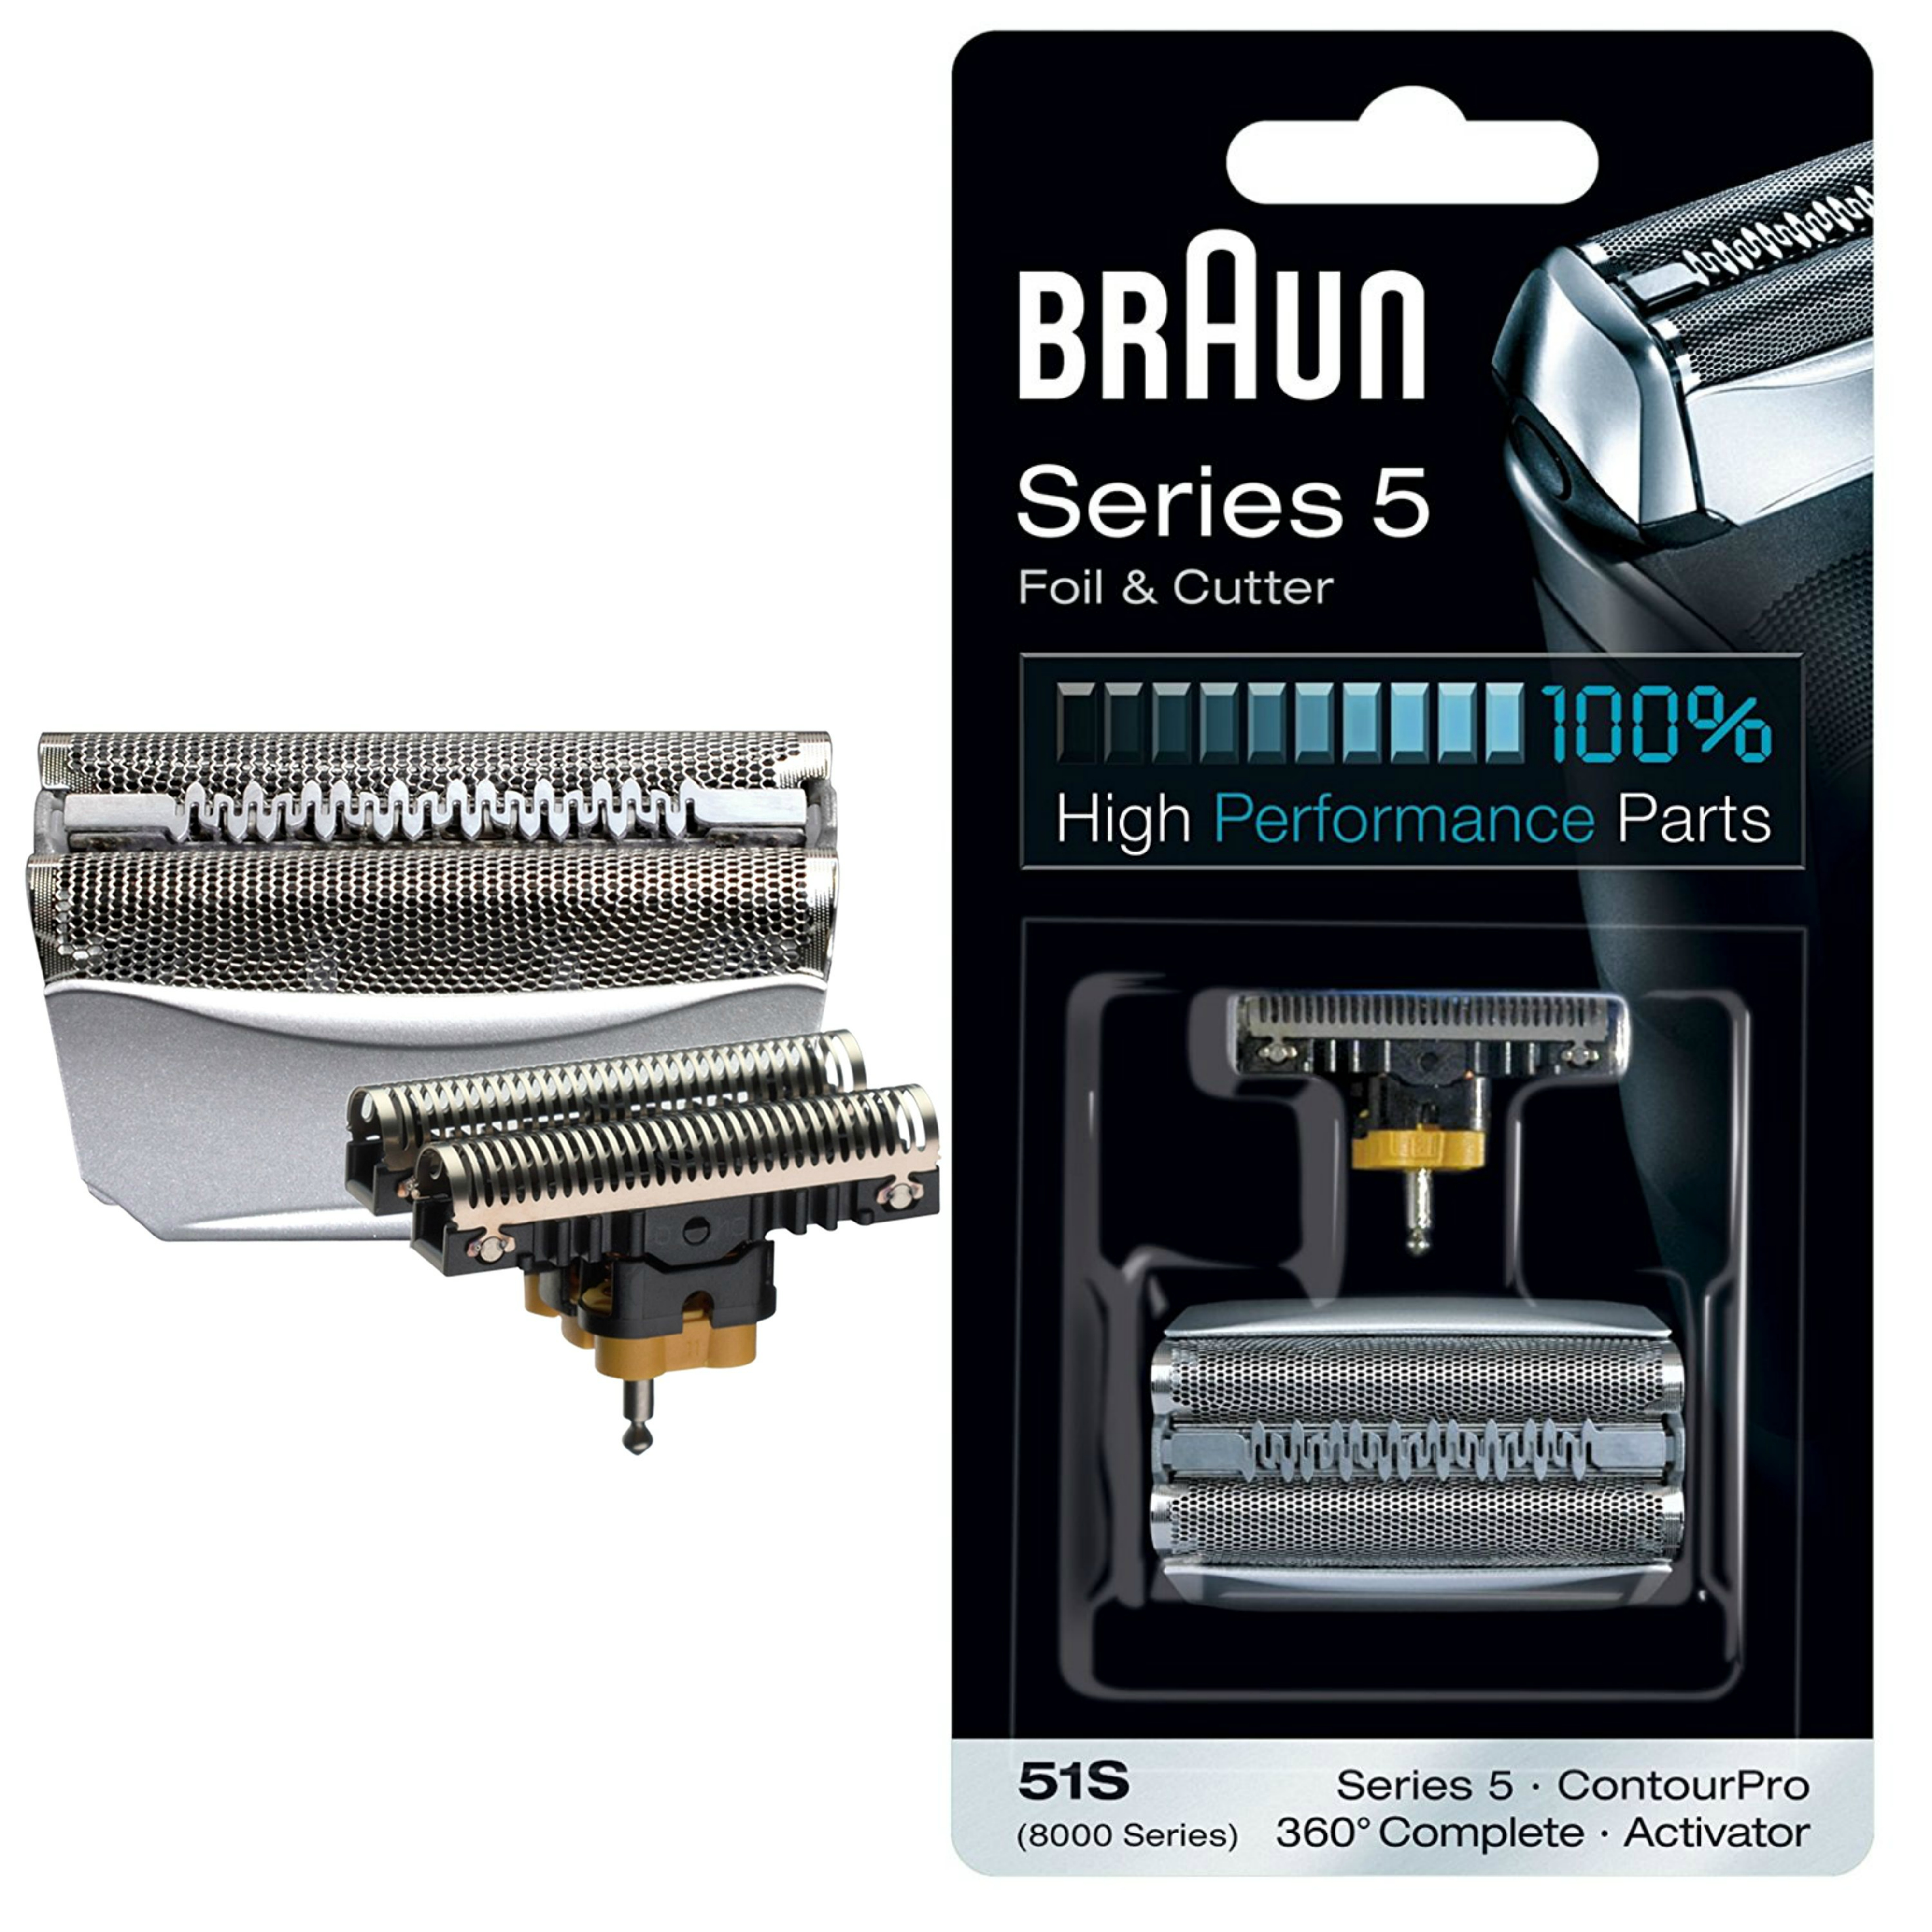 Braun 51S Shaver Foil & Cutter - 8000 Series ContourPro 360°Complete & Activator